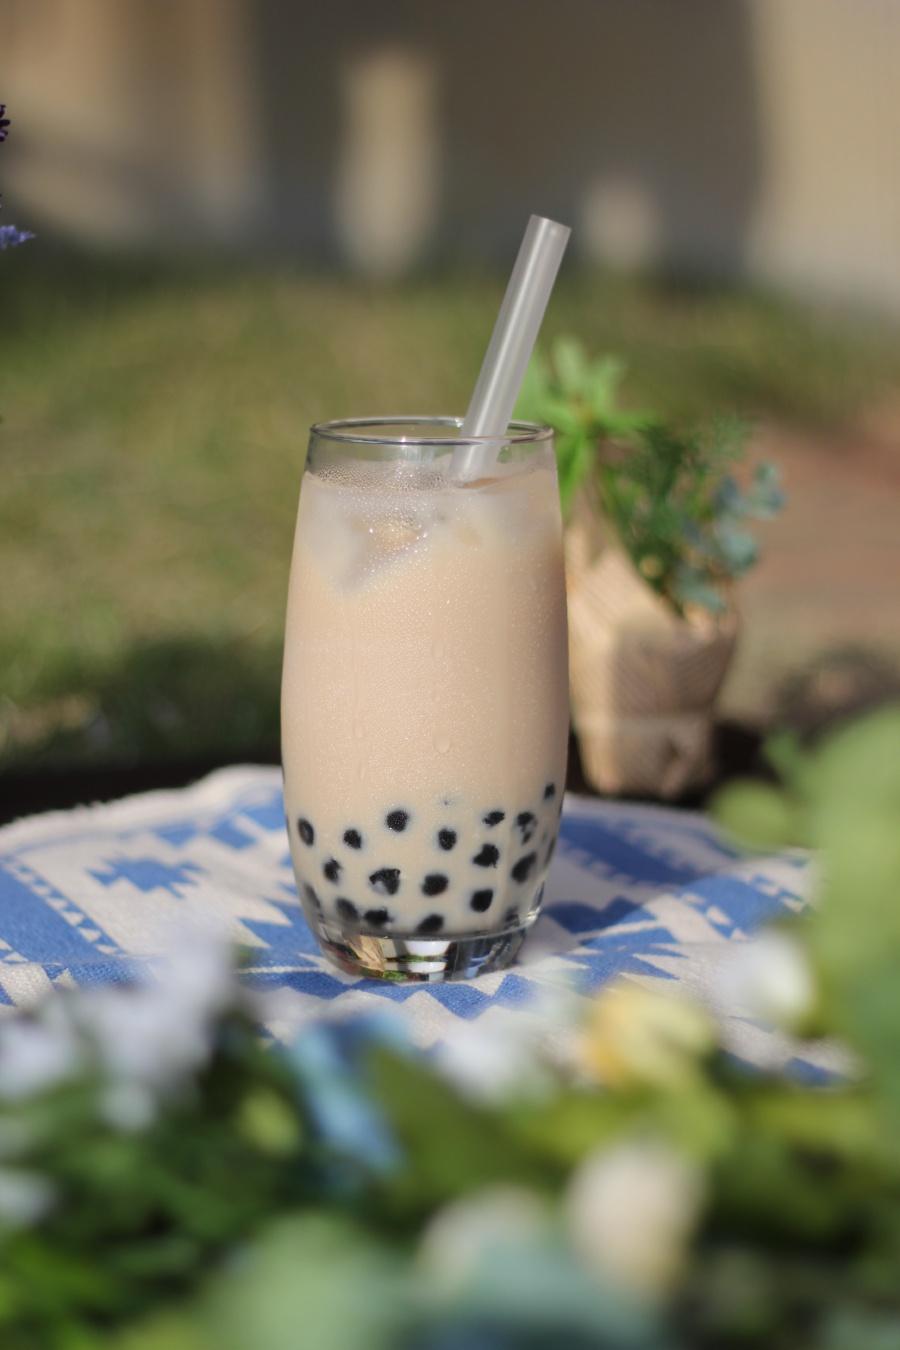 Boba Pearl Milk tea in a Glass